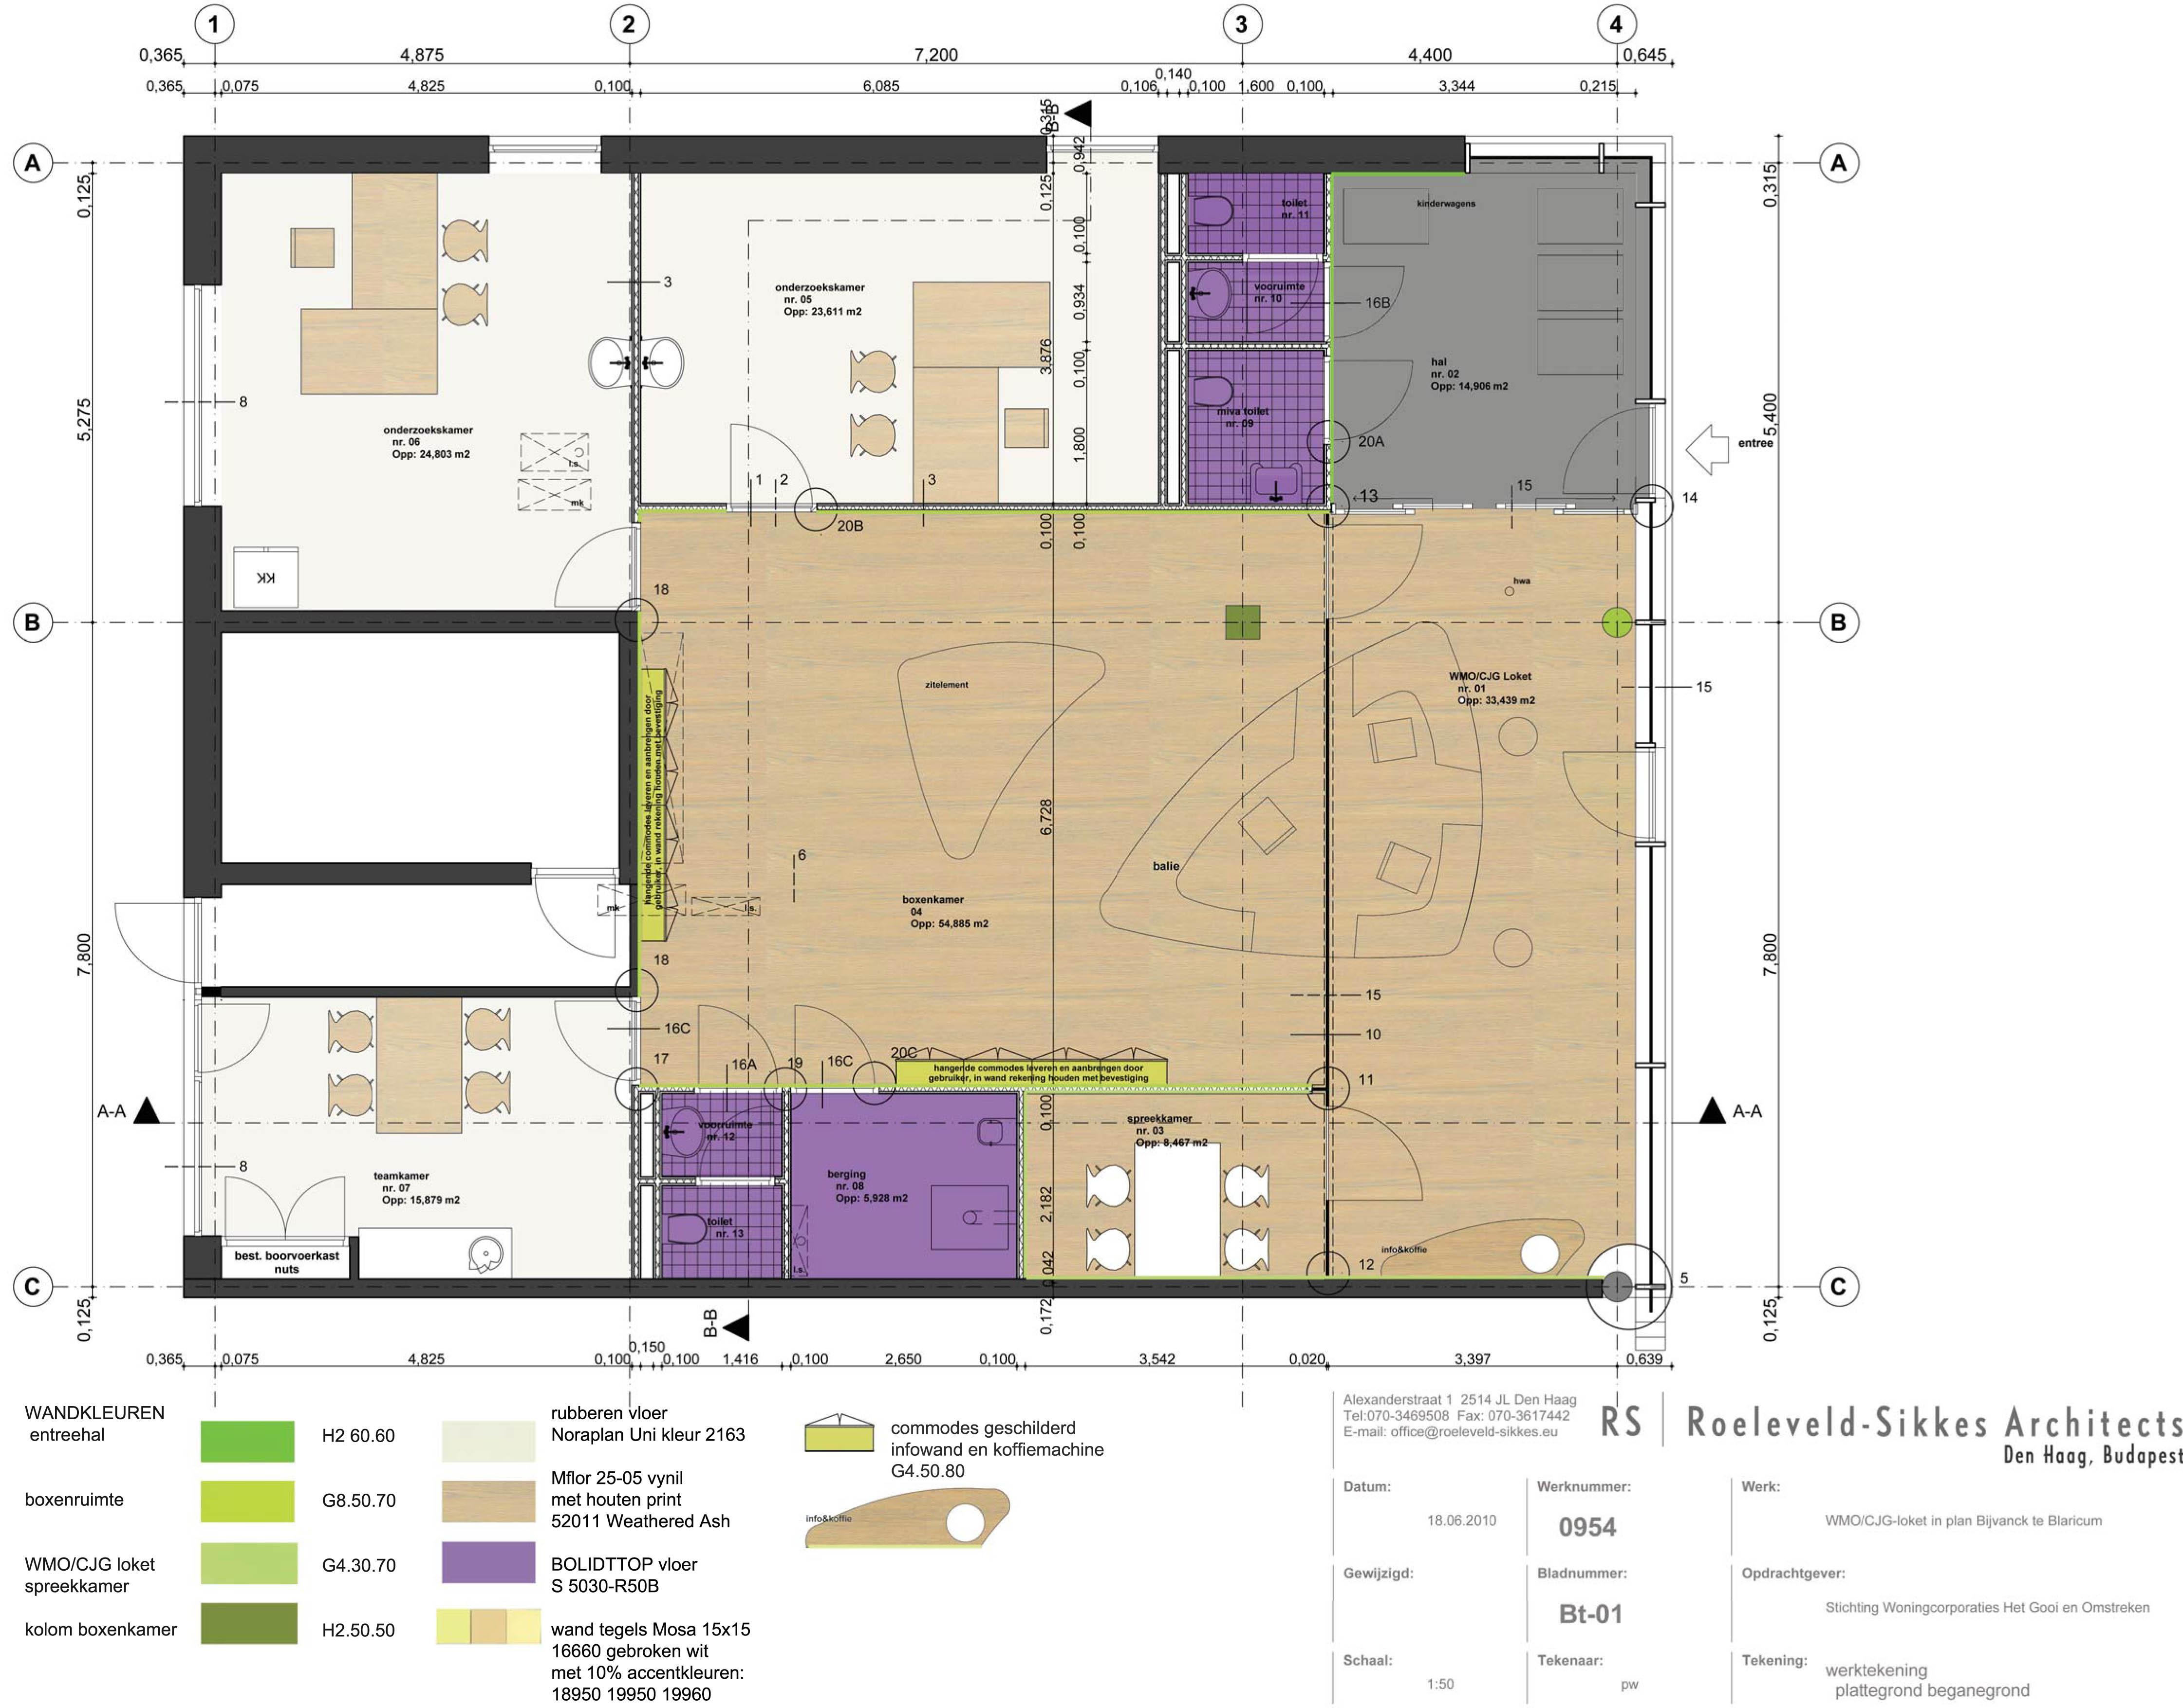 WMO/CJG-loket in plan Bijvanck te Blaricum